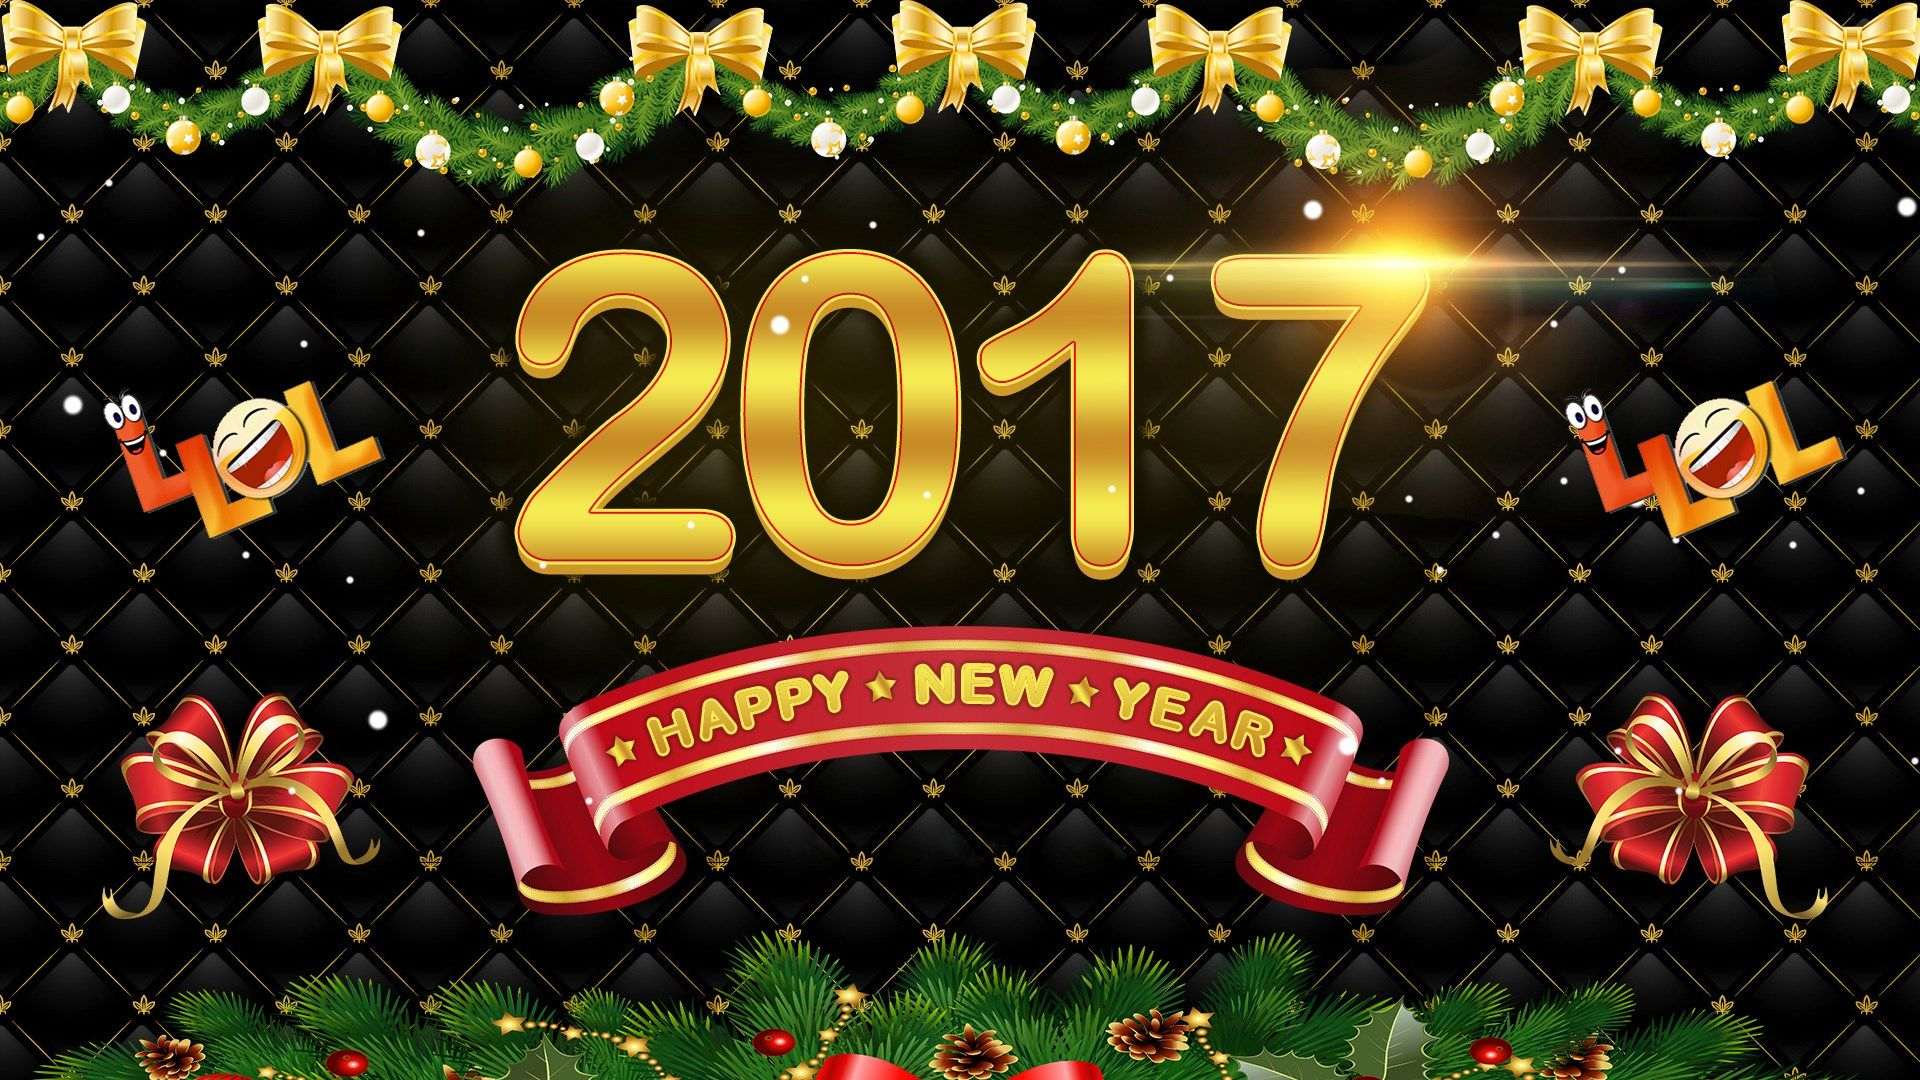 New Year 2017 Free Likeagod Pinterest